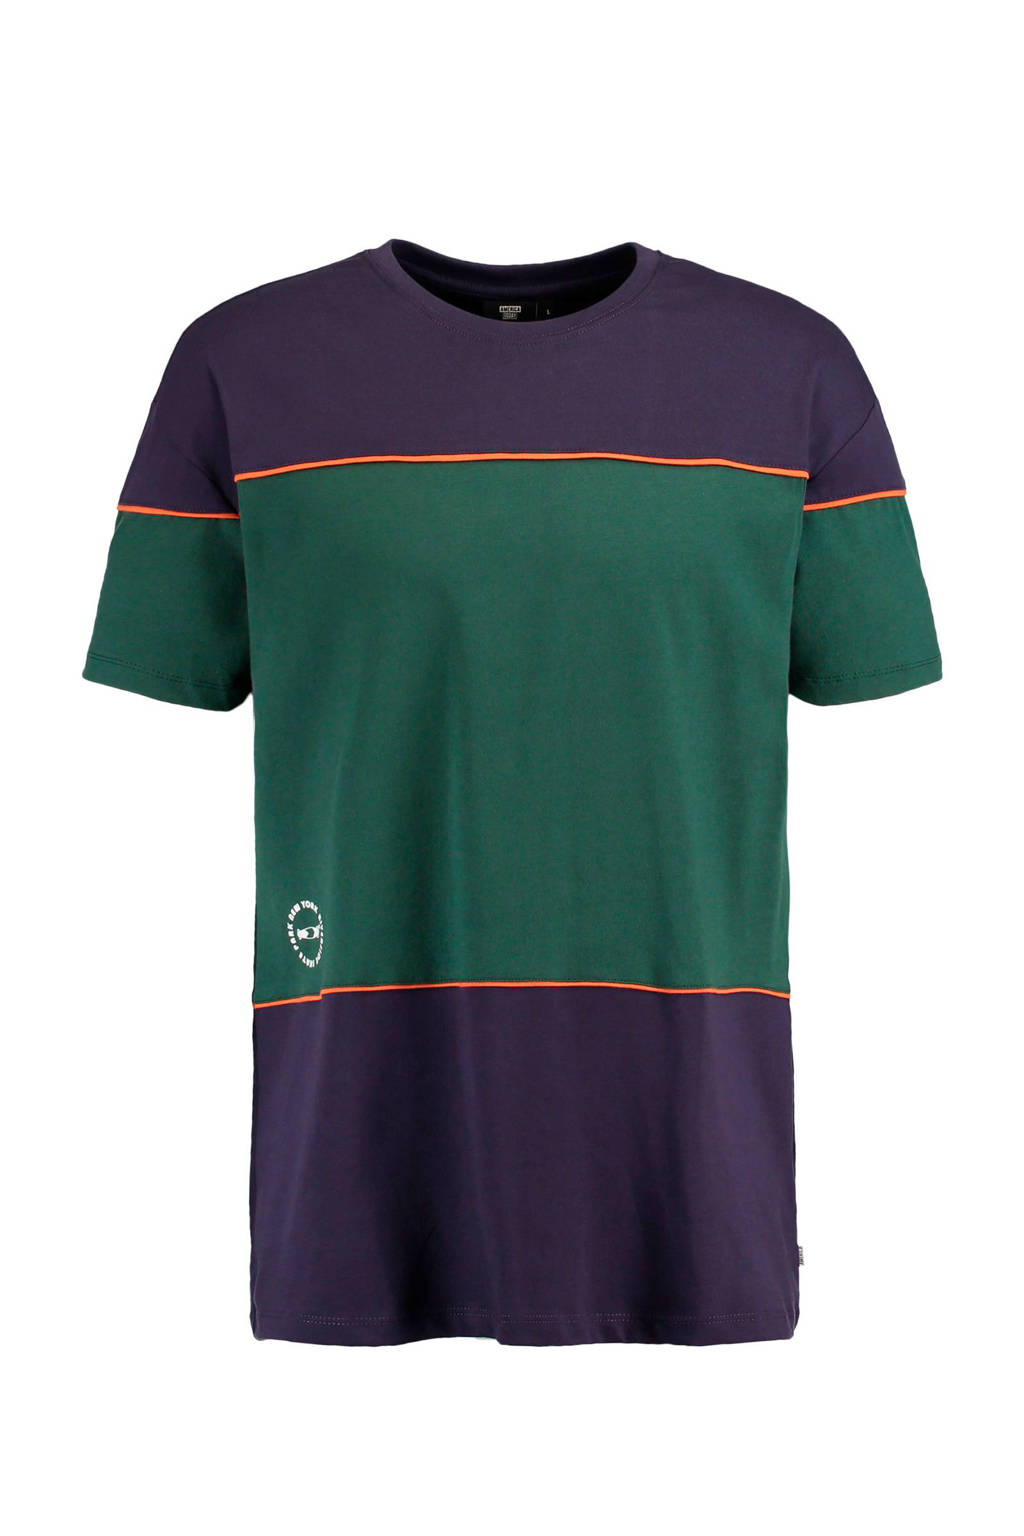 America Today T-shirt paars/groen, Paaqrs/groen